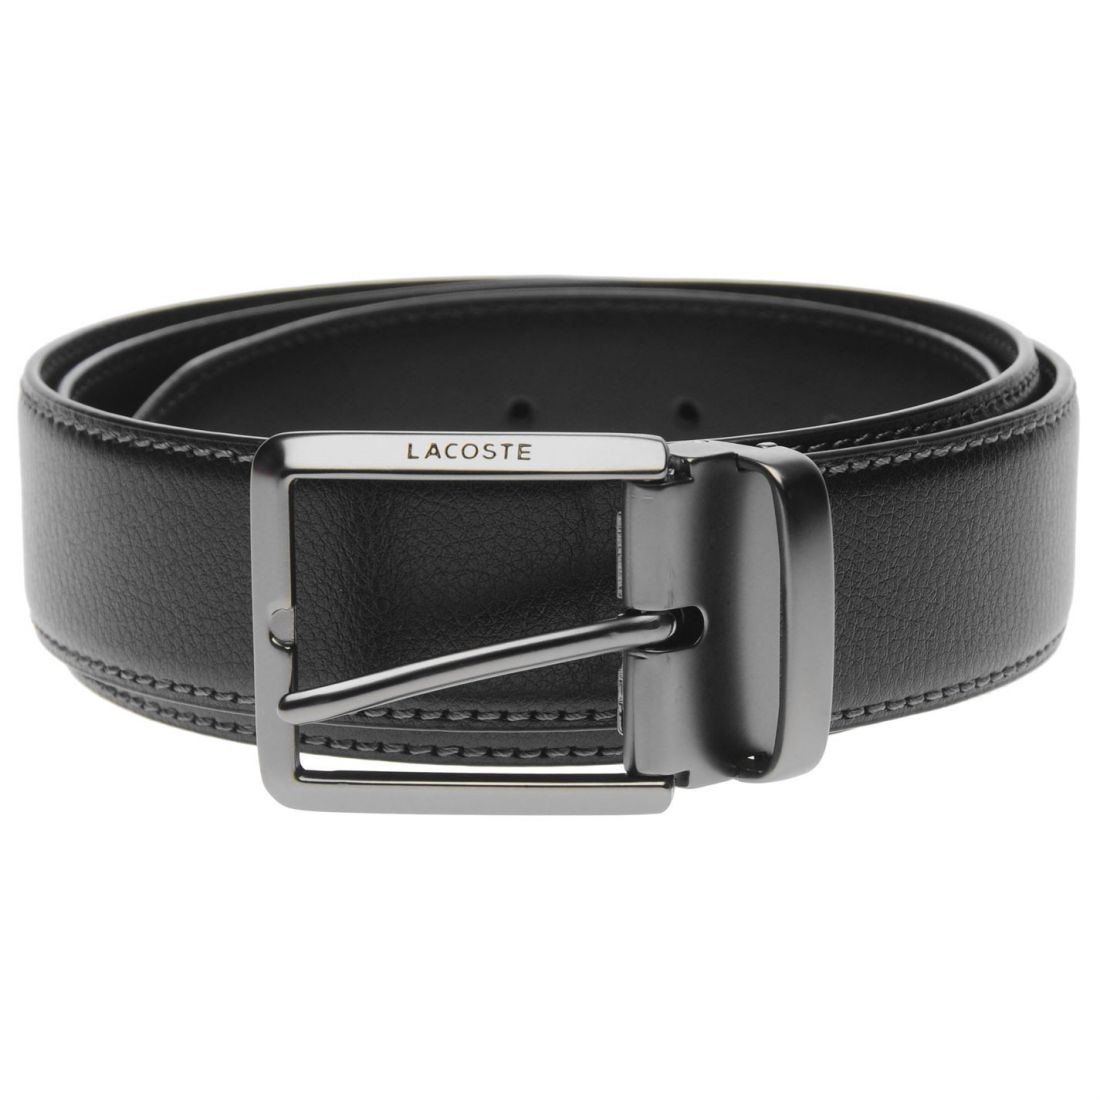 bdc4667e6d31 Details about Mens Lacoste Engraved Buckle Leather Belt New